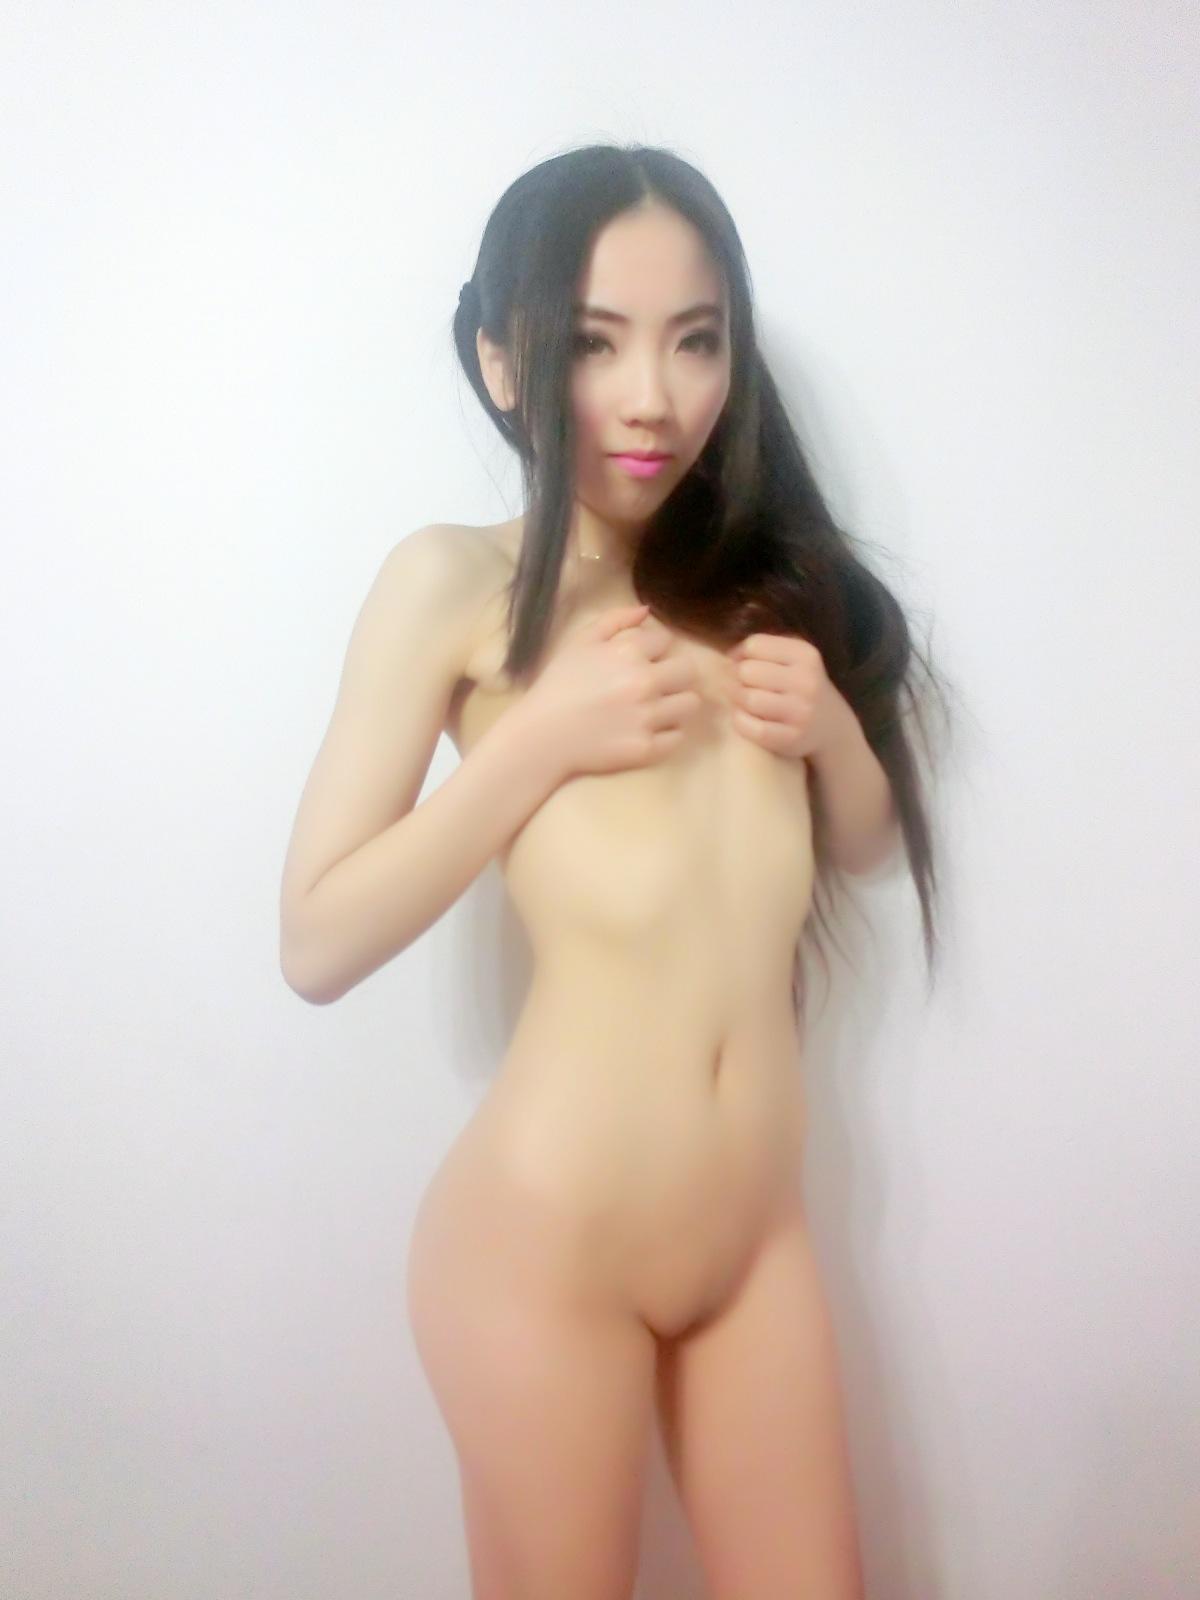 Skinny femjoy nude babe